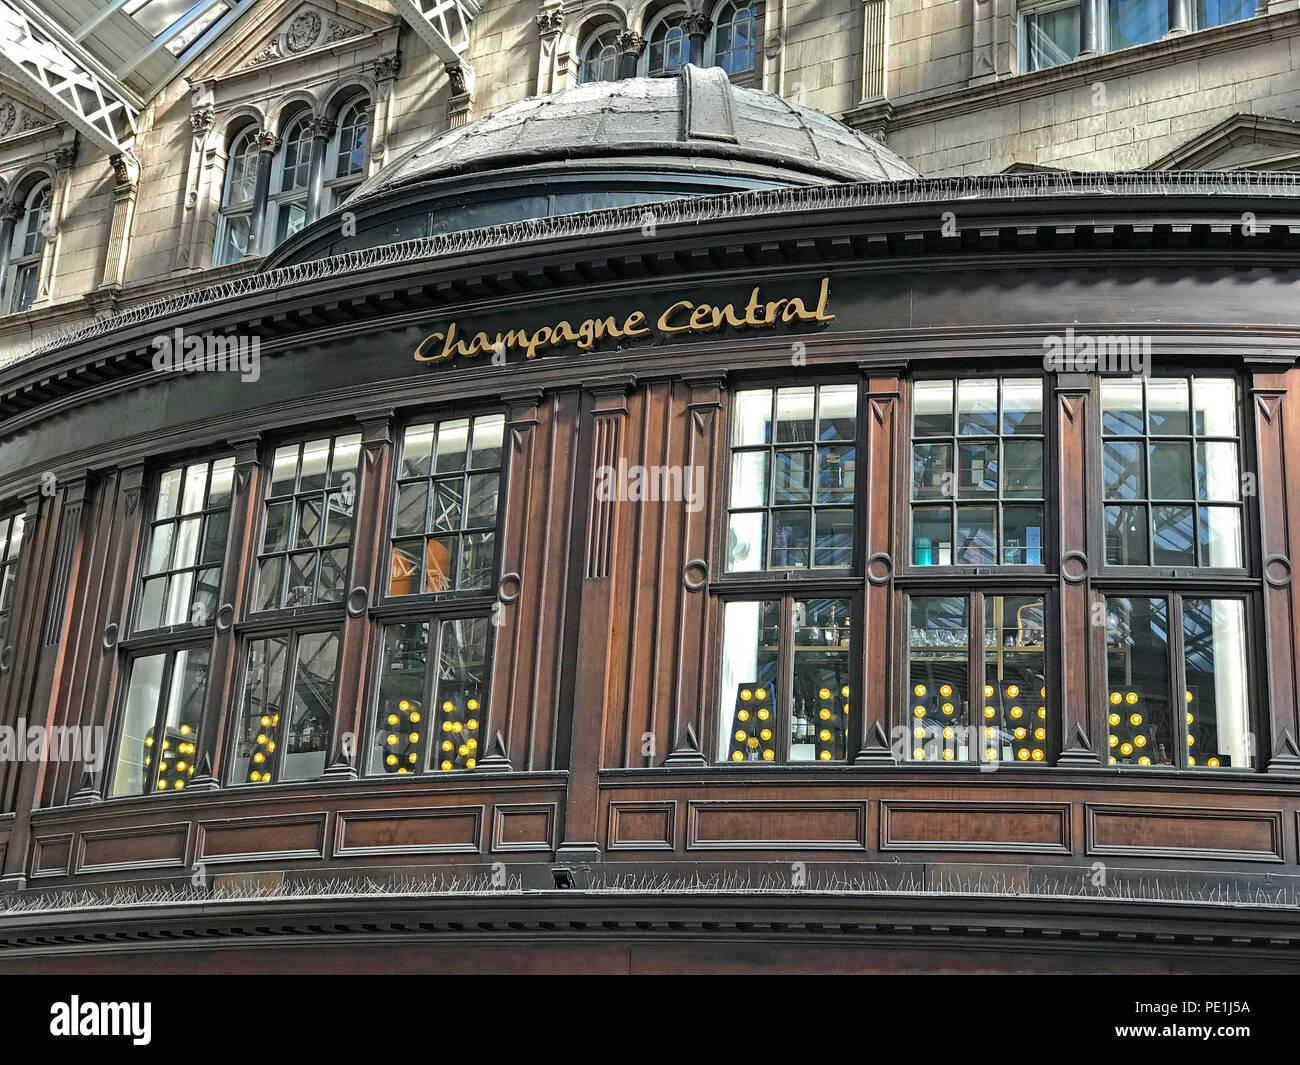 GoTonySmith @HotpixUK,Champagne Central bar,Gordon St,Scotland,UK,GoTonySmith,@HotpixUK,city centre,Gordon street,Gordon st,drinking,tourist,tourism,Champagne Central bar glasgow